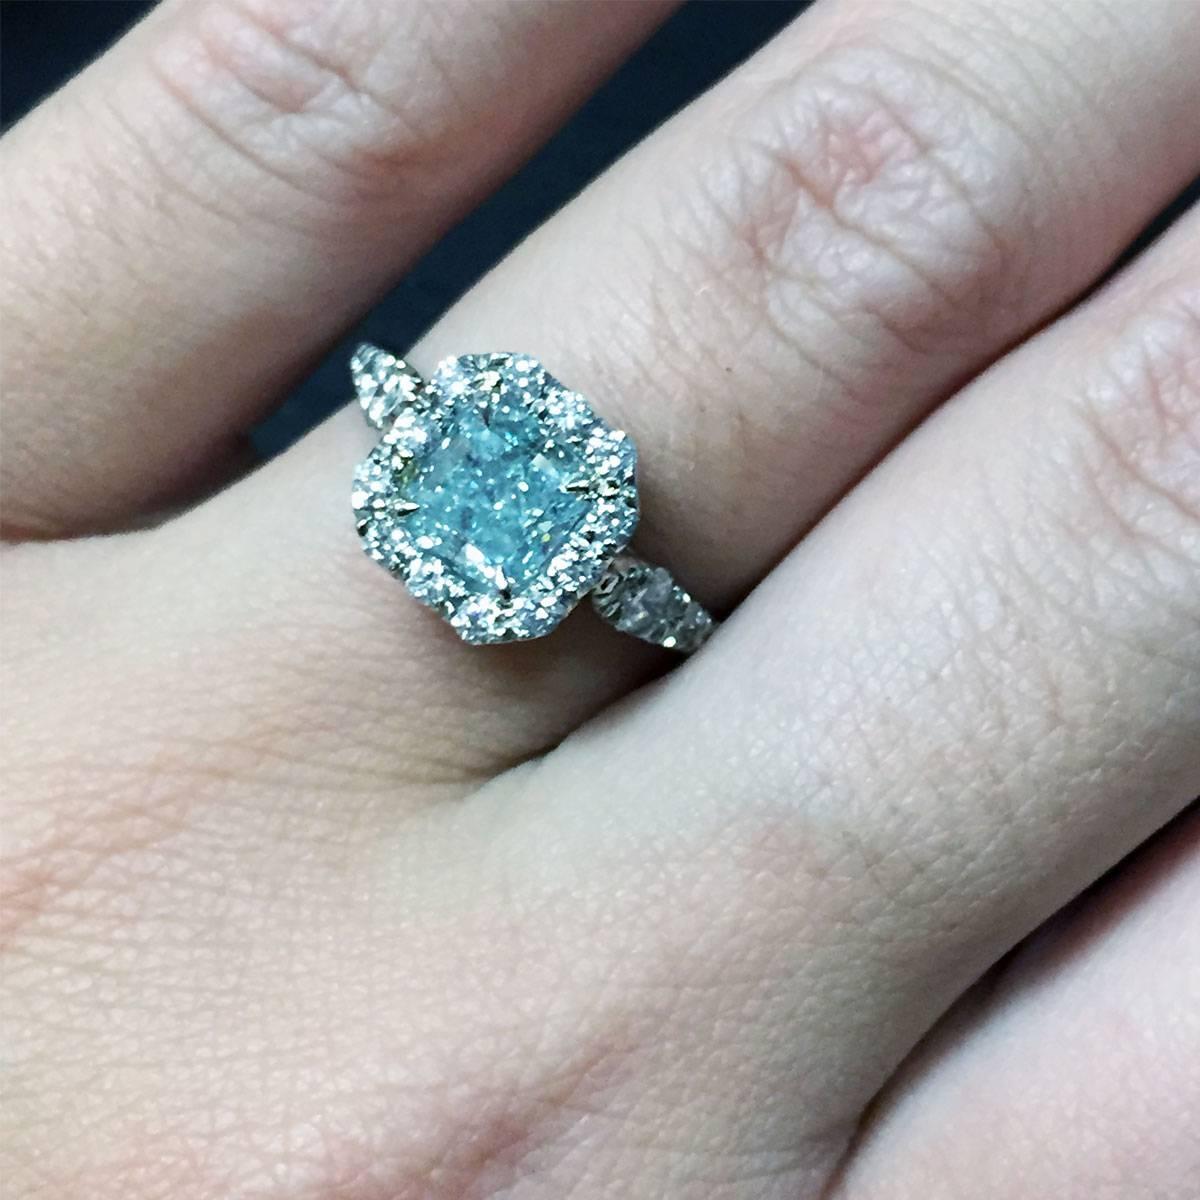 Rings : Affordable Diamond Rings Diamond Stackable Rings Diamond Regarding Newest Affordable Anniversary Rings (Gallery 22 of 25)